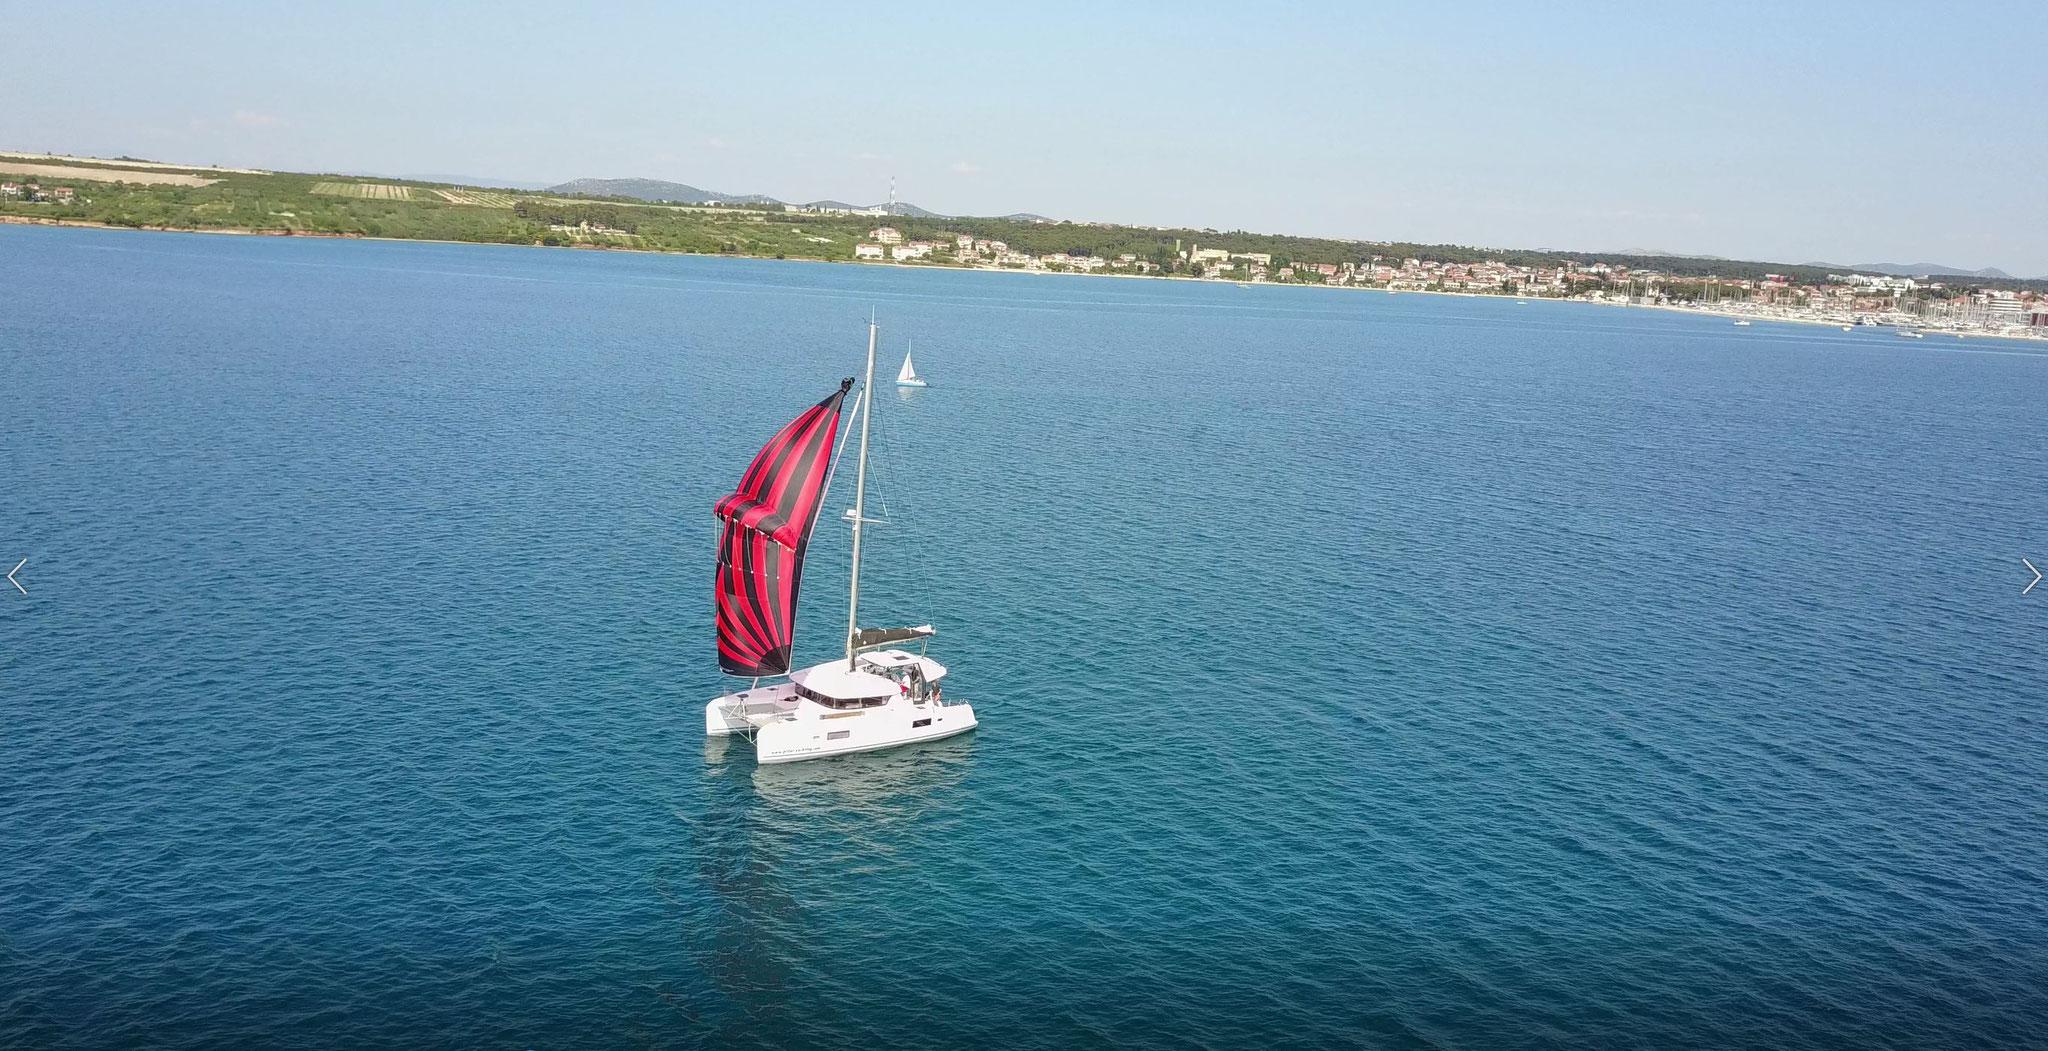 Karamaran fahren als Mitsegeln über den Atlantik      -     www.katamarantraum.com